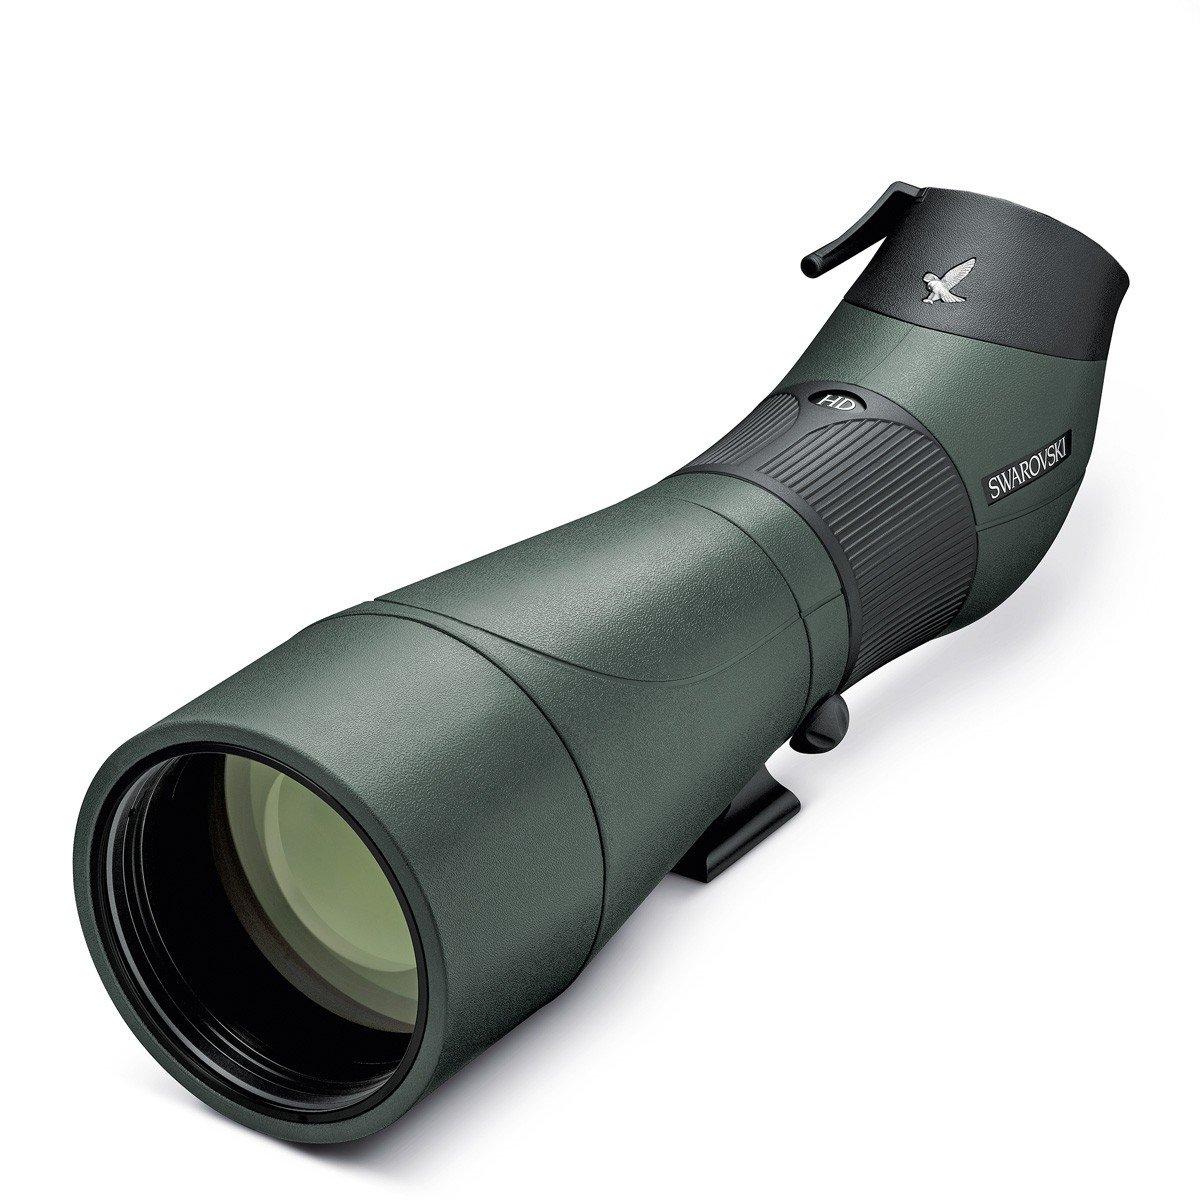 Swarovski Spotting Scope HD-ATS 80 High Definition Glass (Eyepiece not Included)